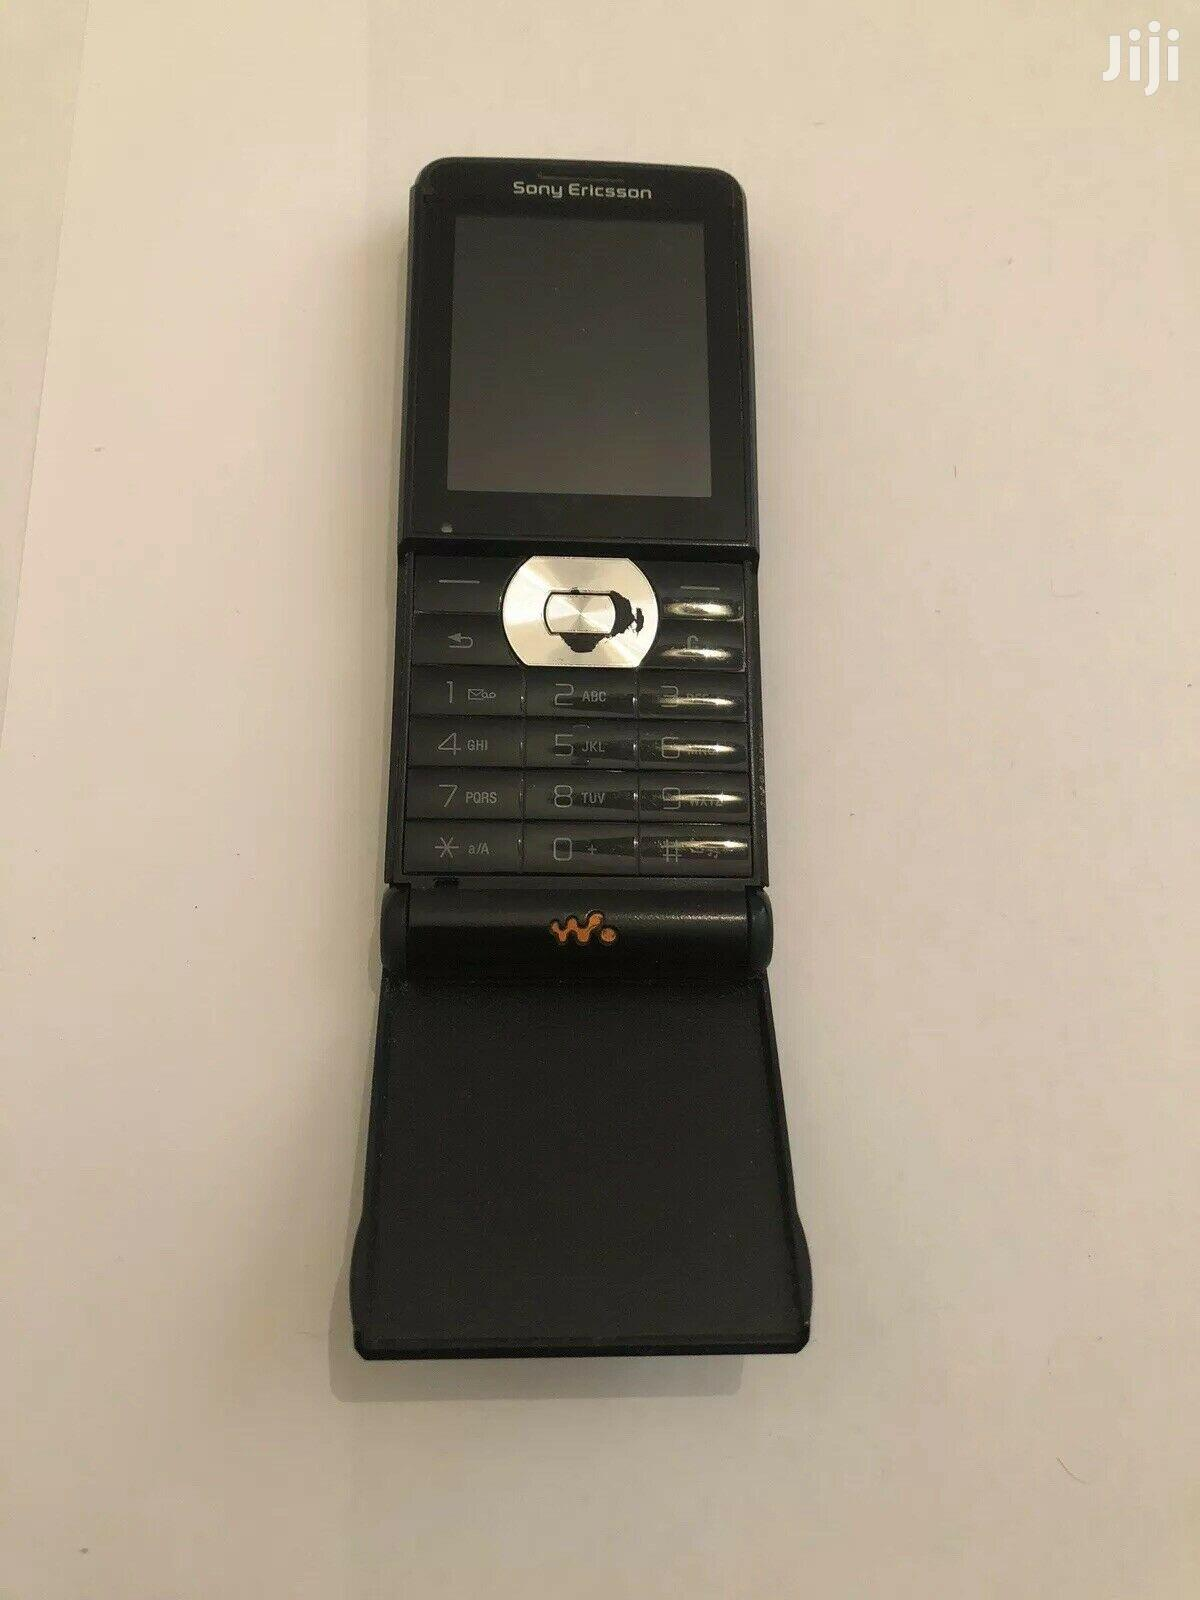 Sony Ericsson W350 Black   Mobile Phones for sale in Akweteyman, Greater Accra, Ghana